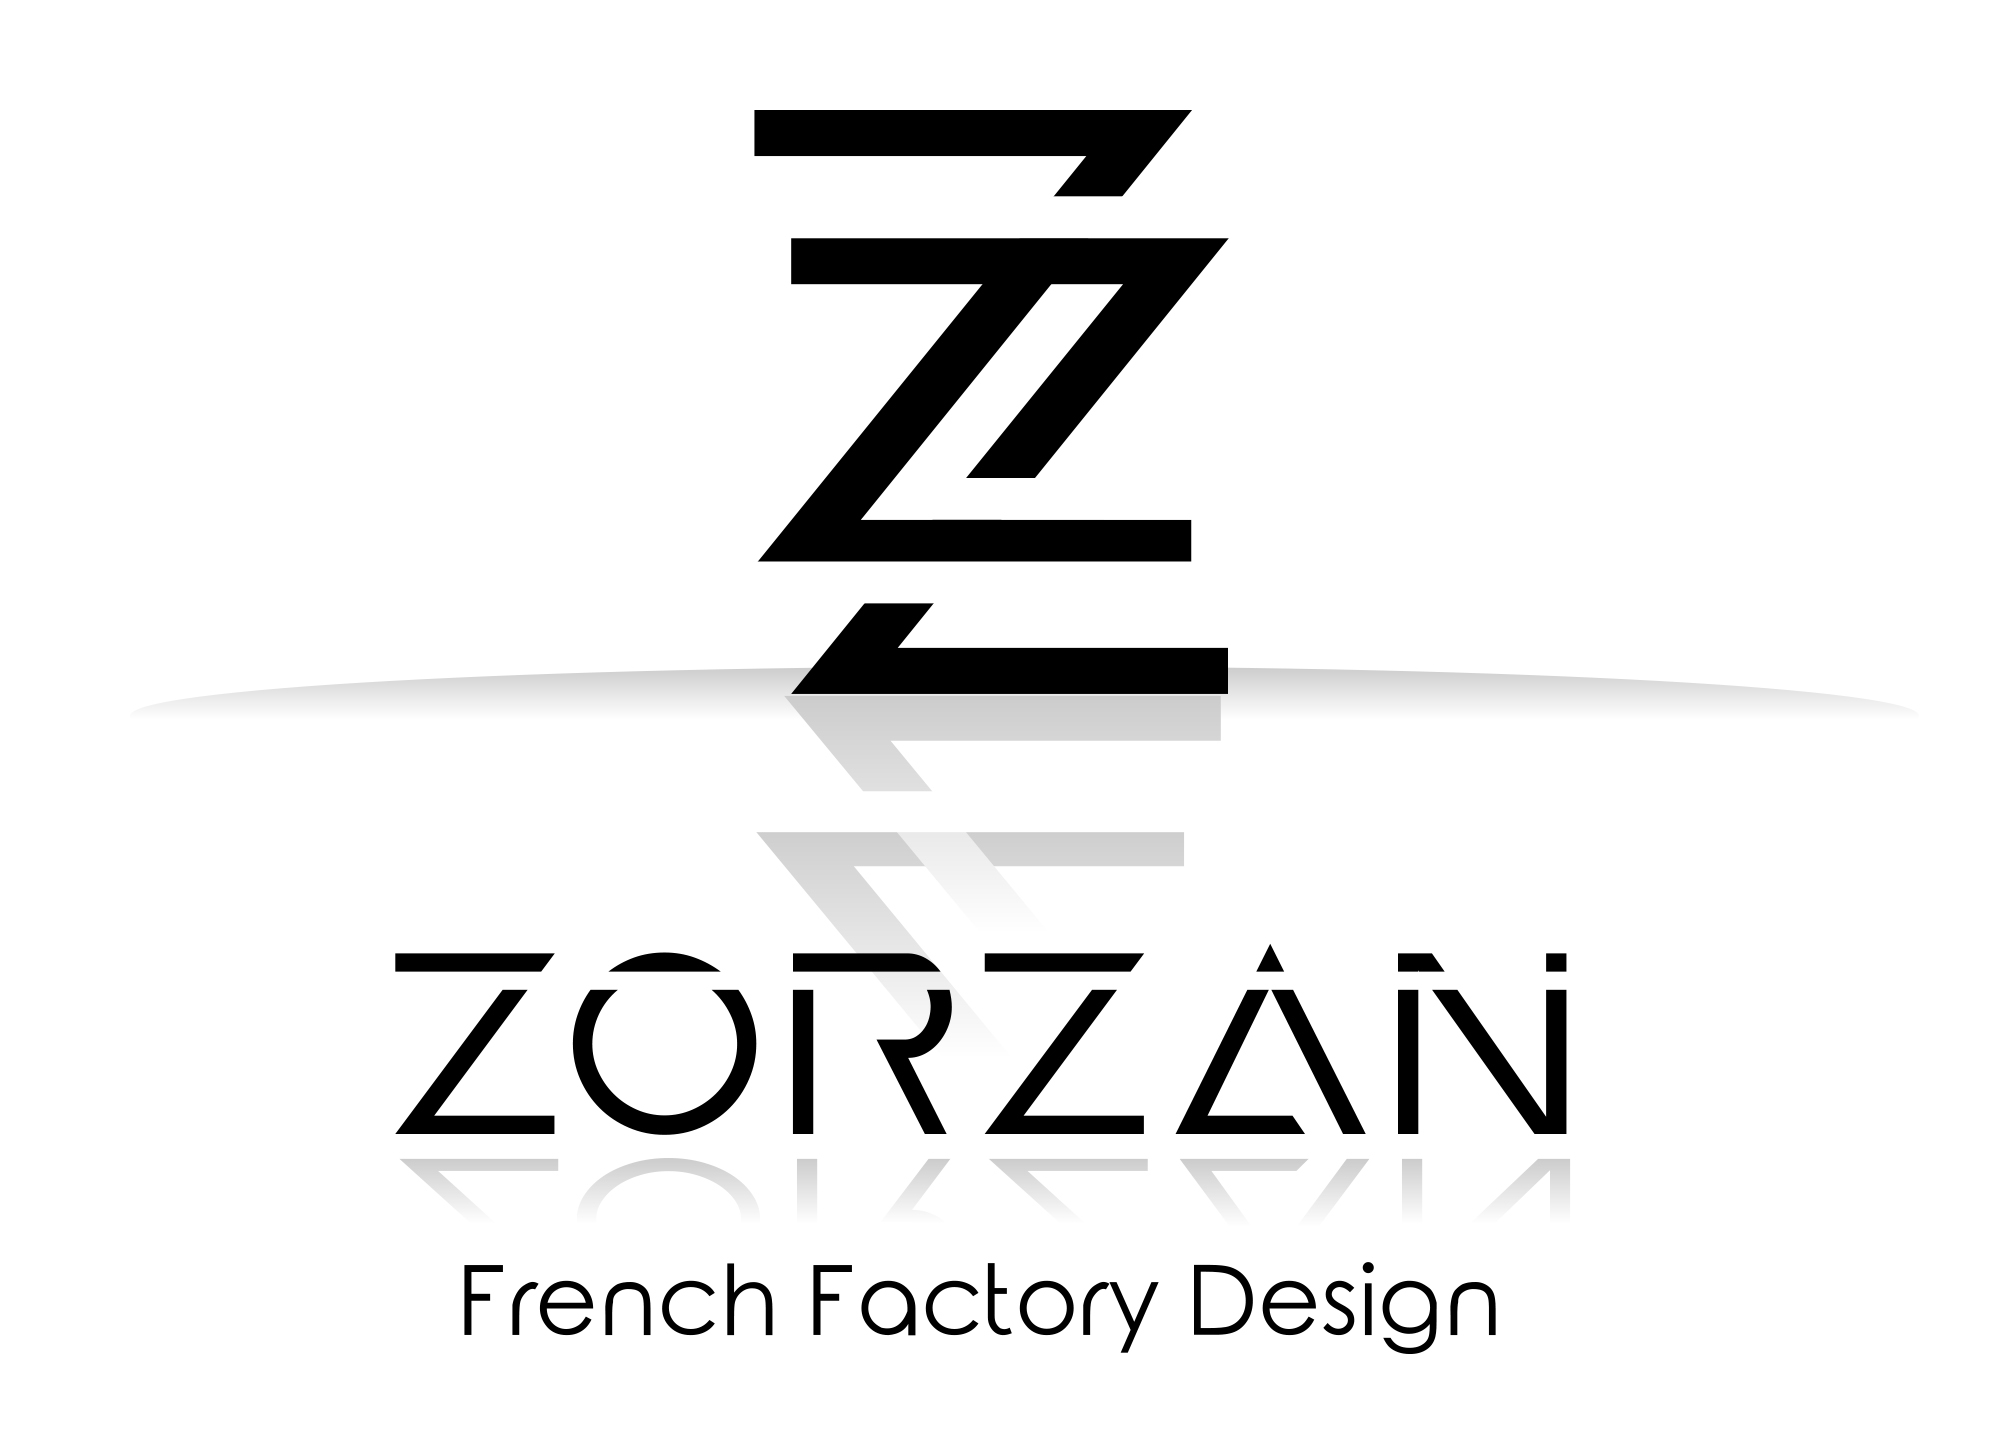 Sylvain Zorzan